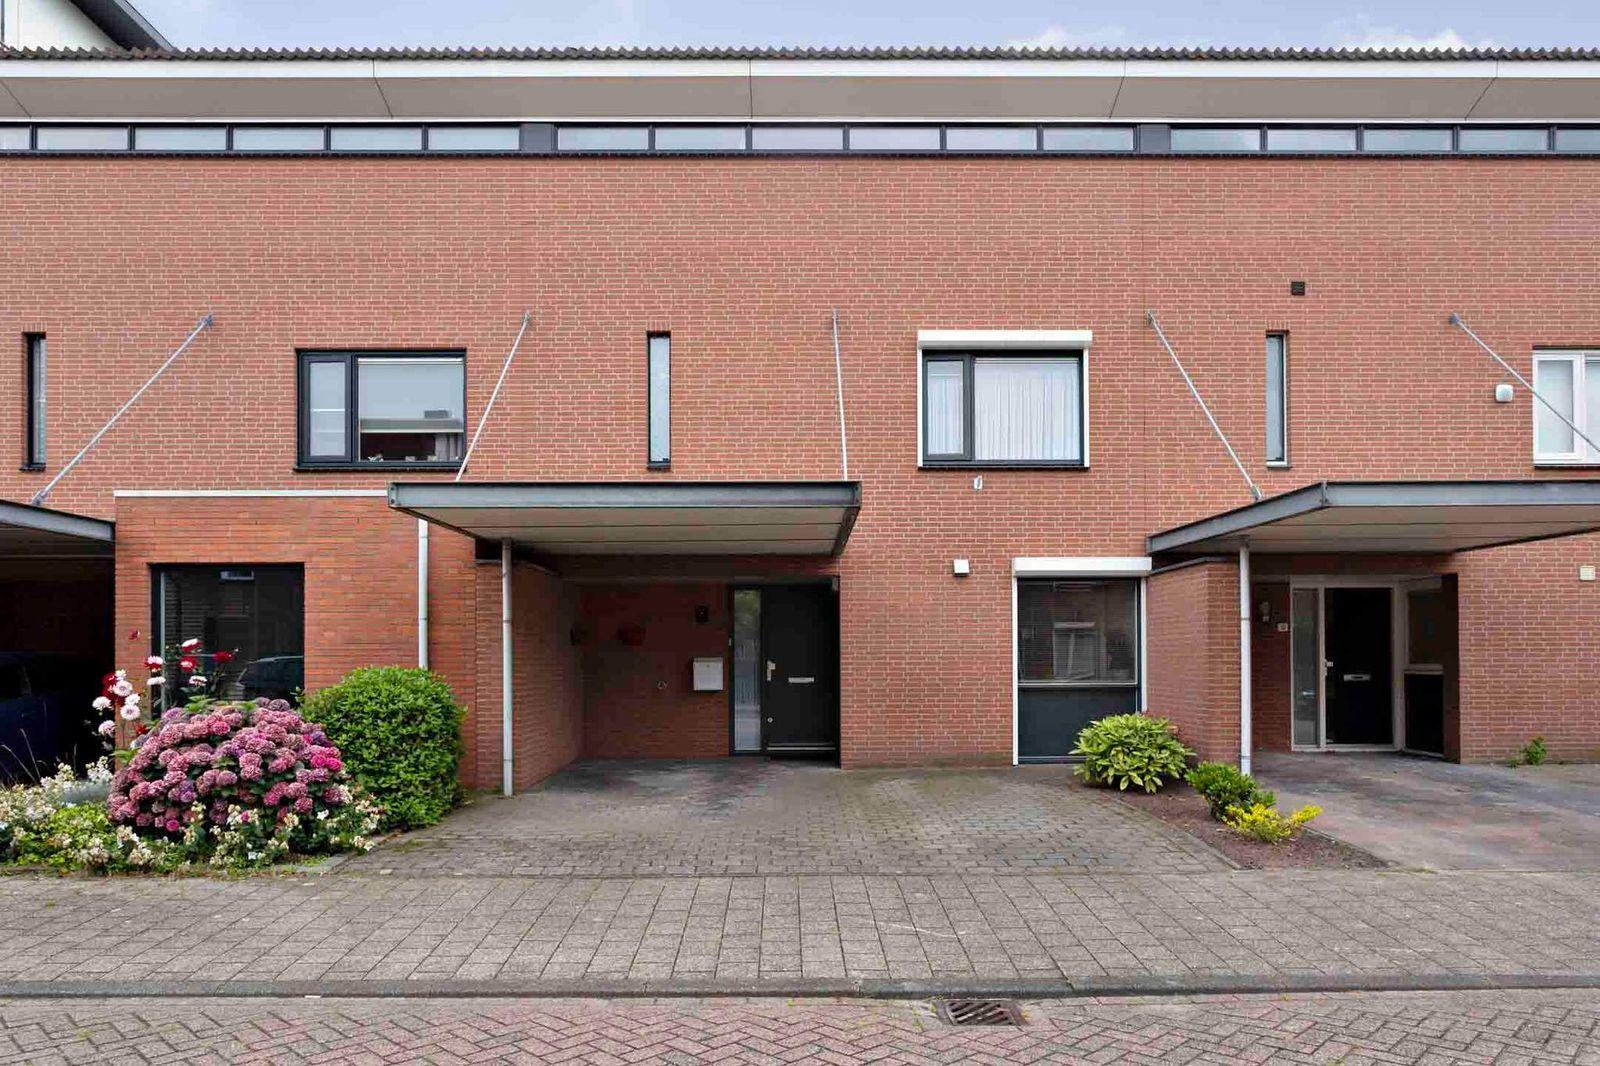 Heer Halewijnstraat 12, Oosterhout NB